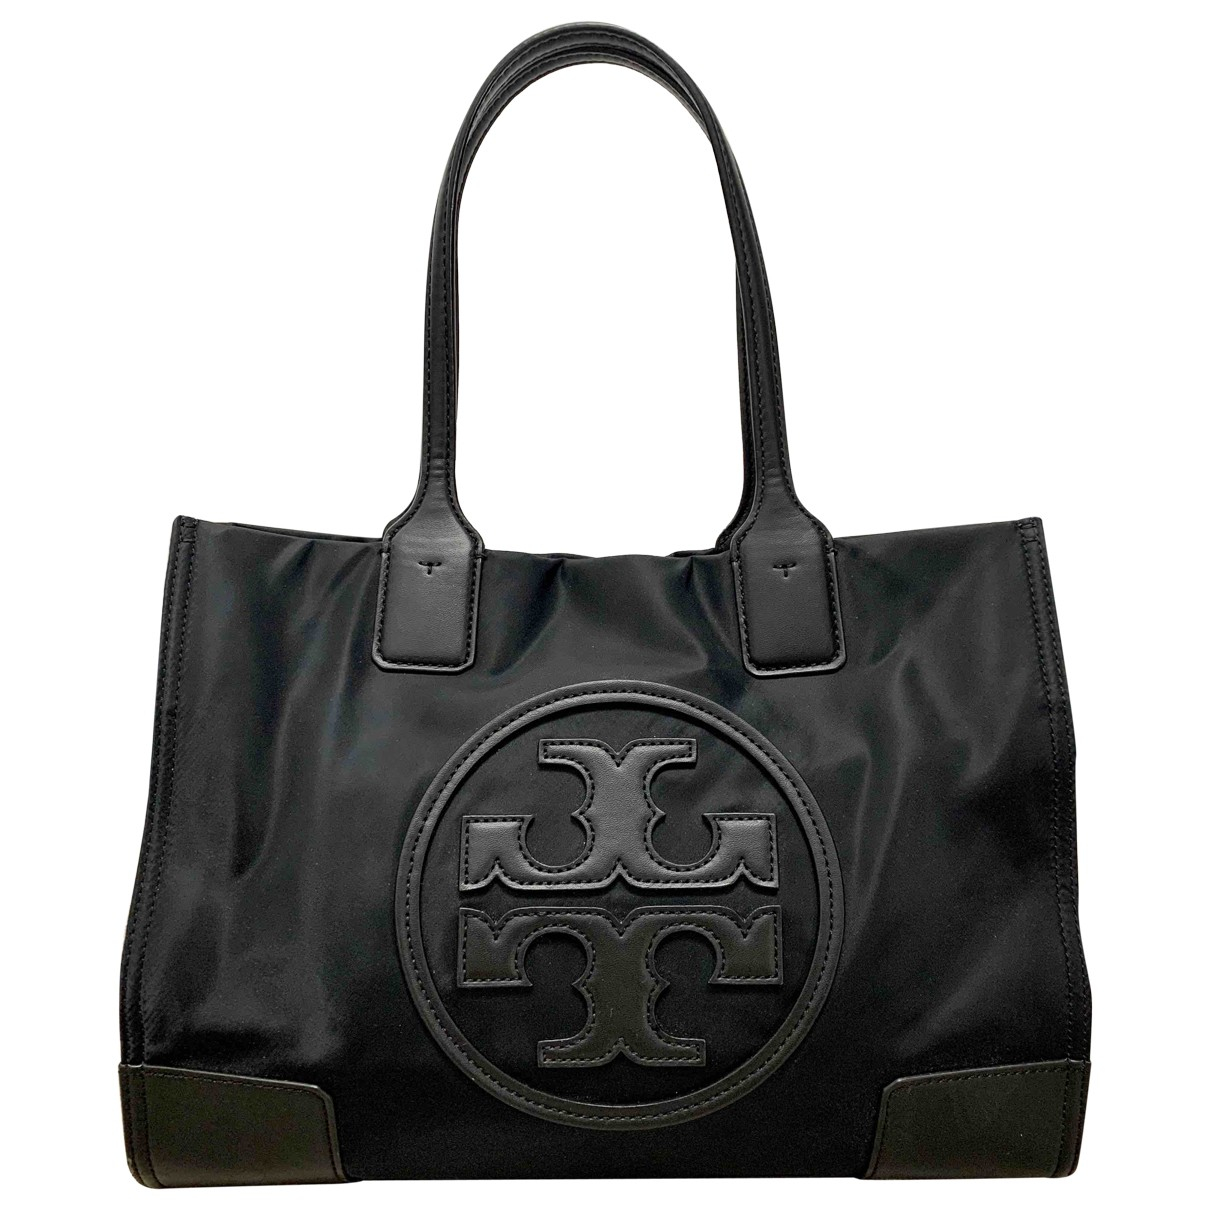 Tory Burch \N Black handbag for Women \N